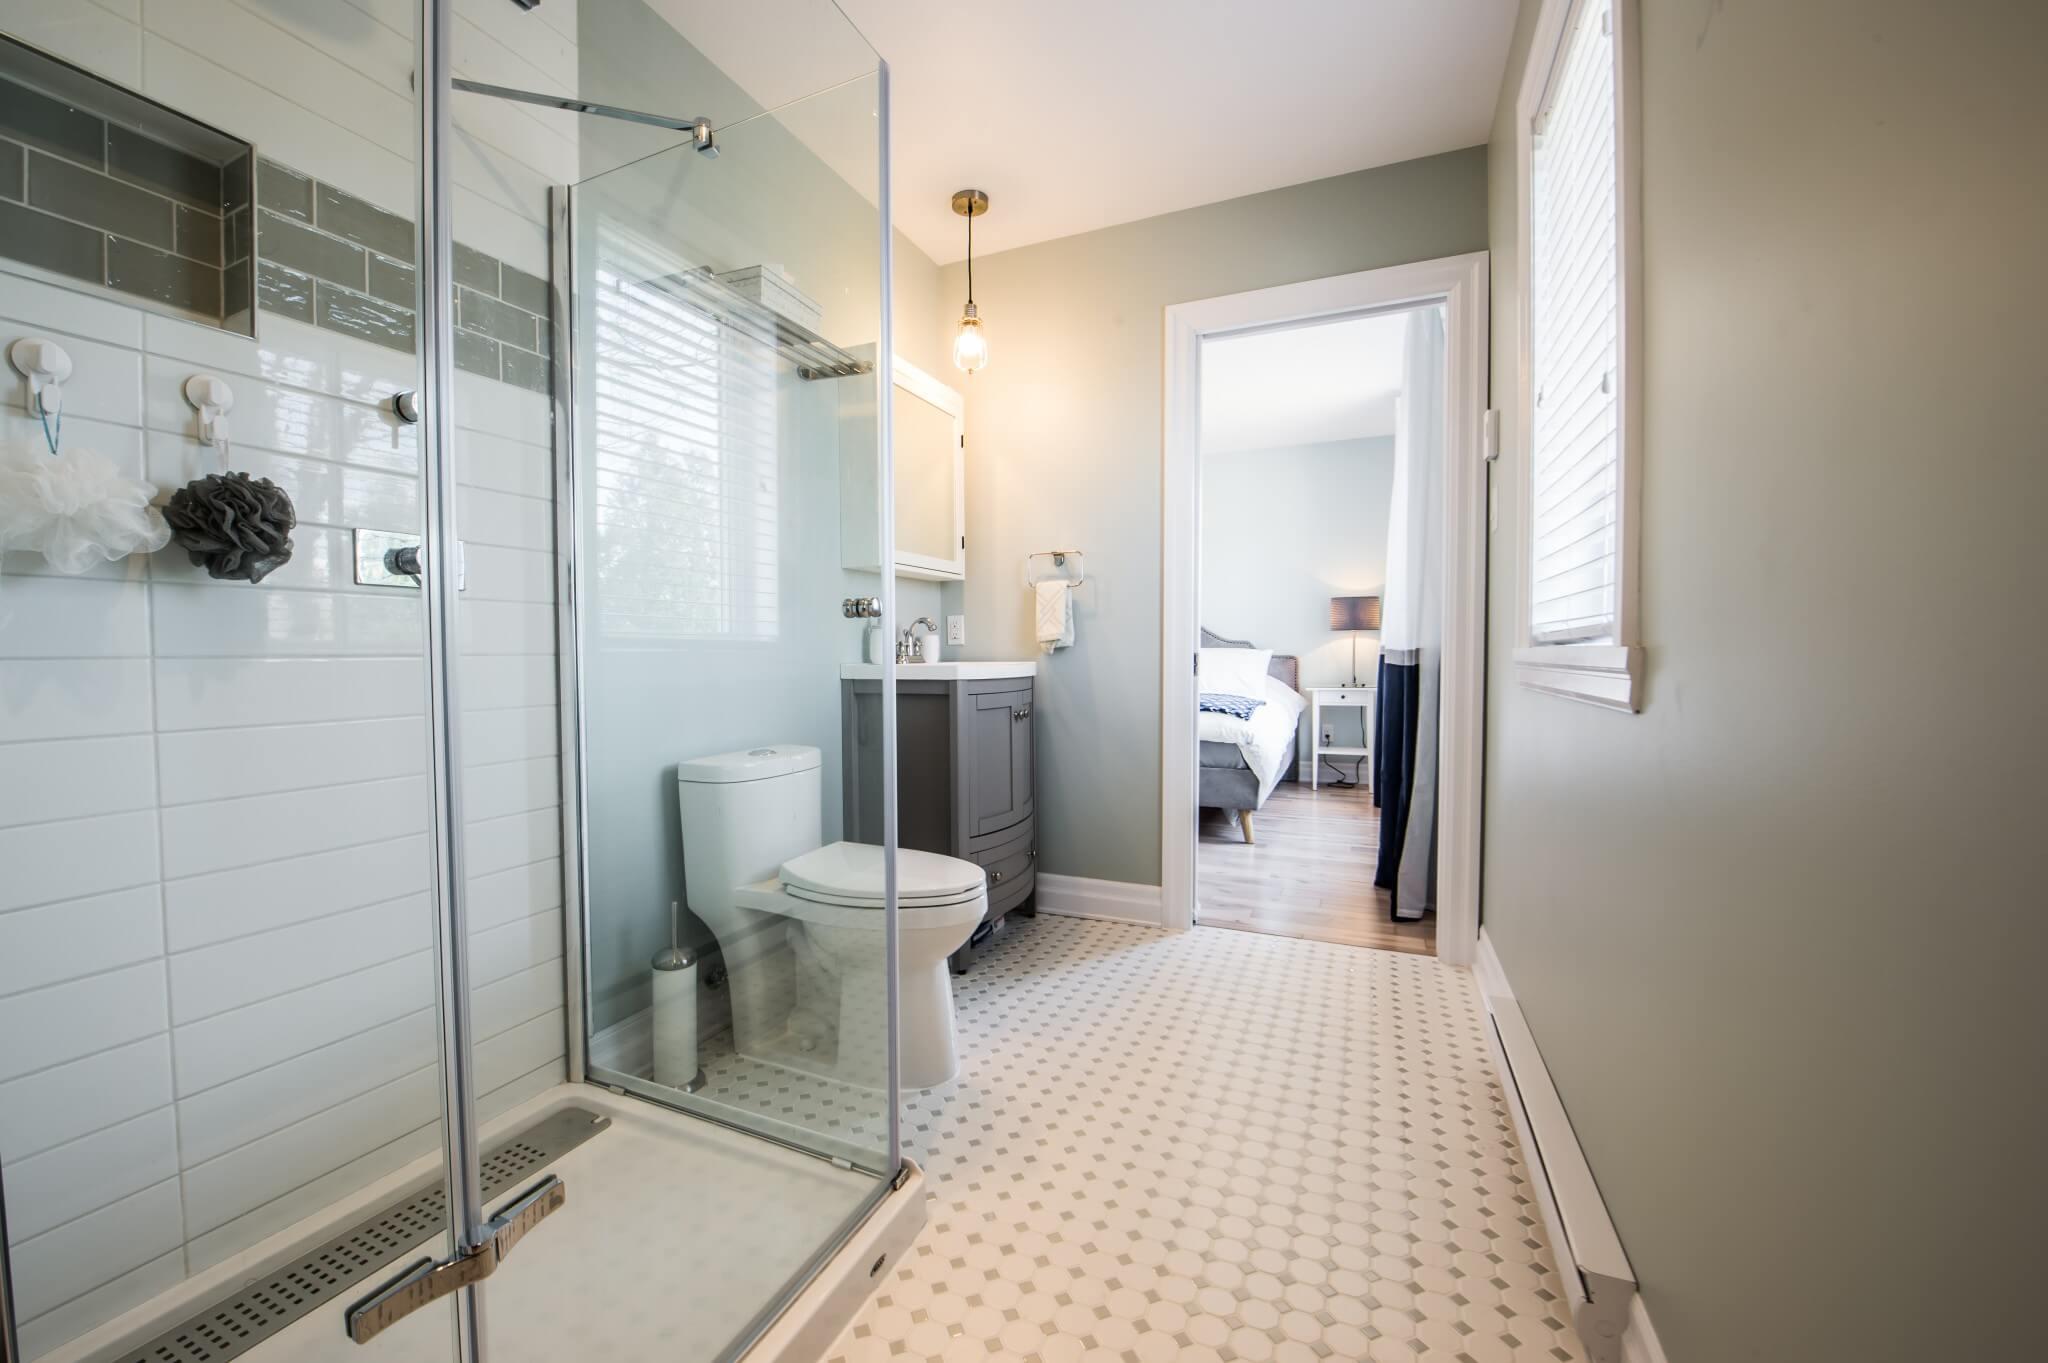 douche vitree salle de bain